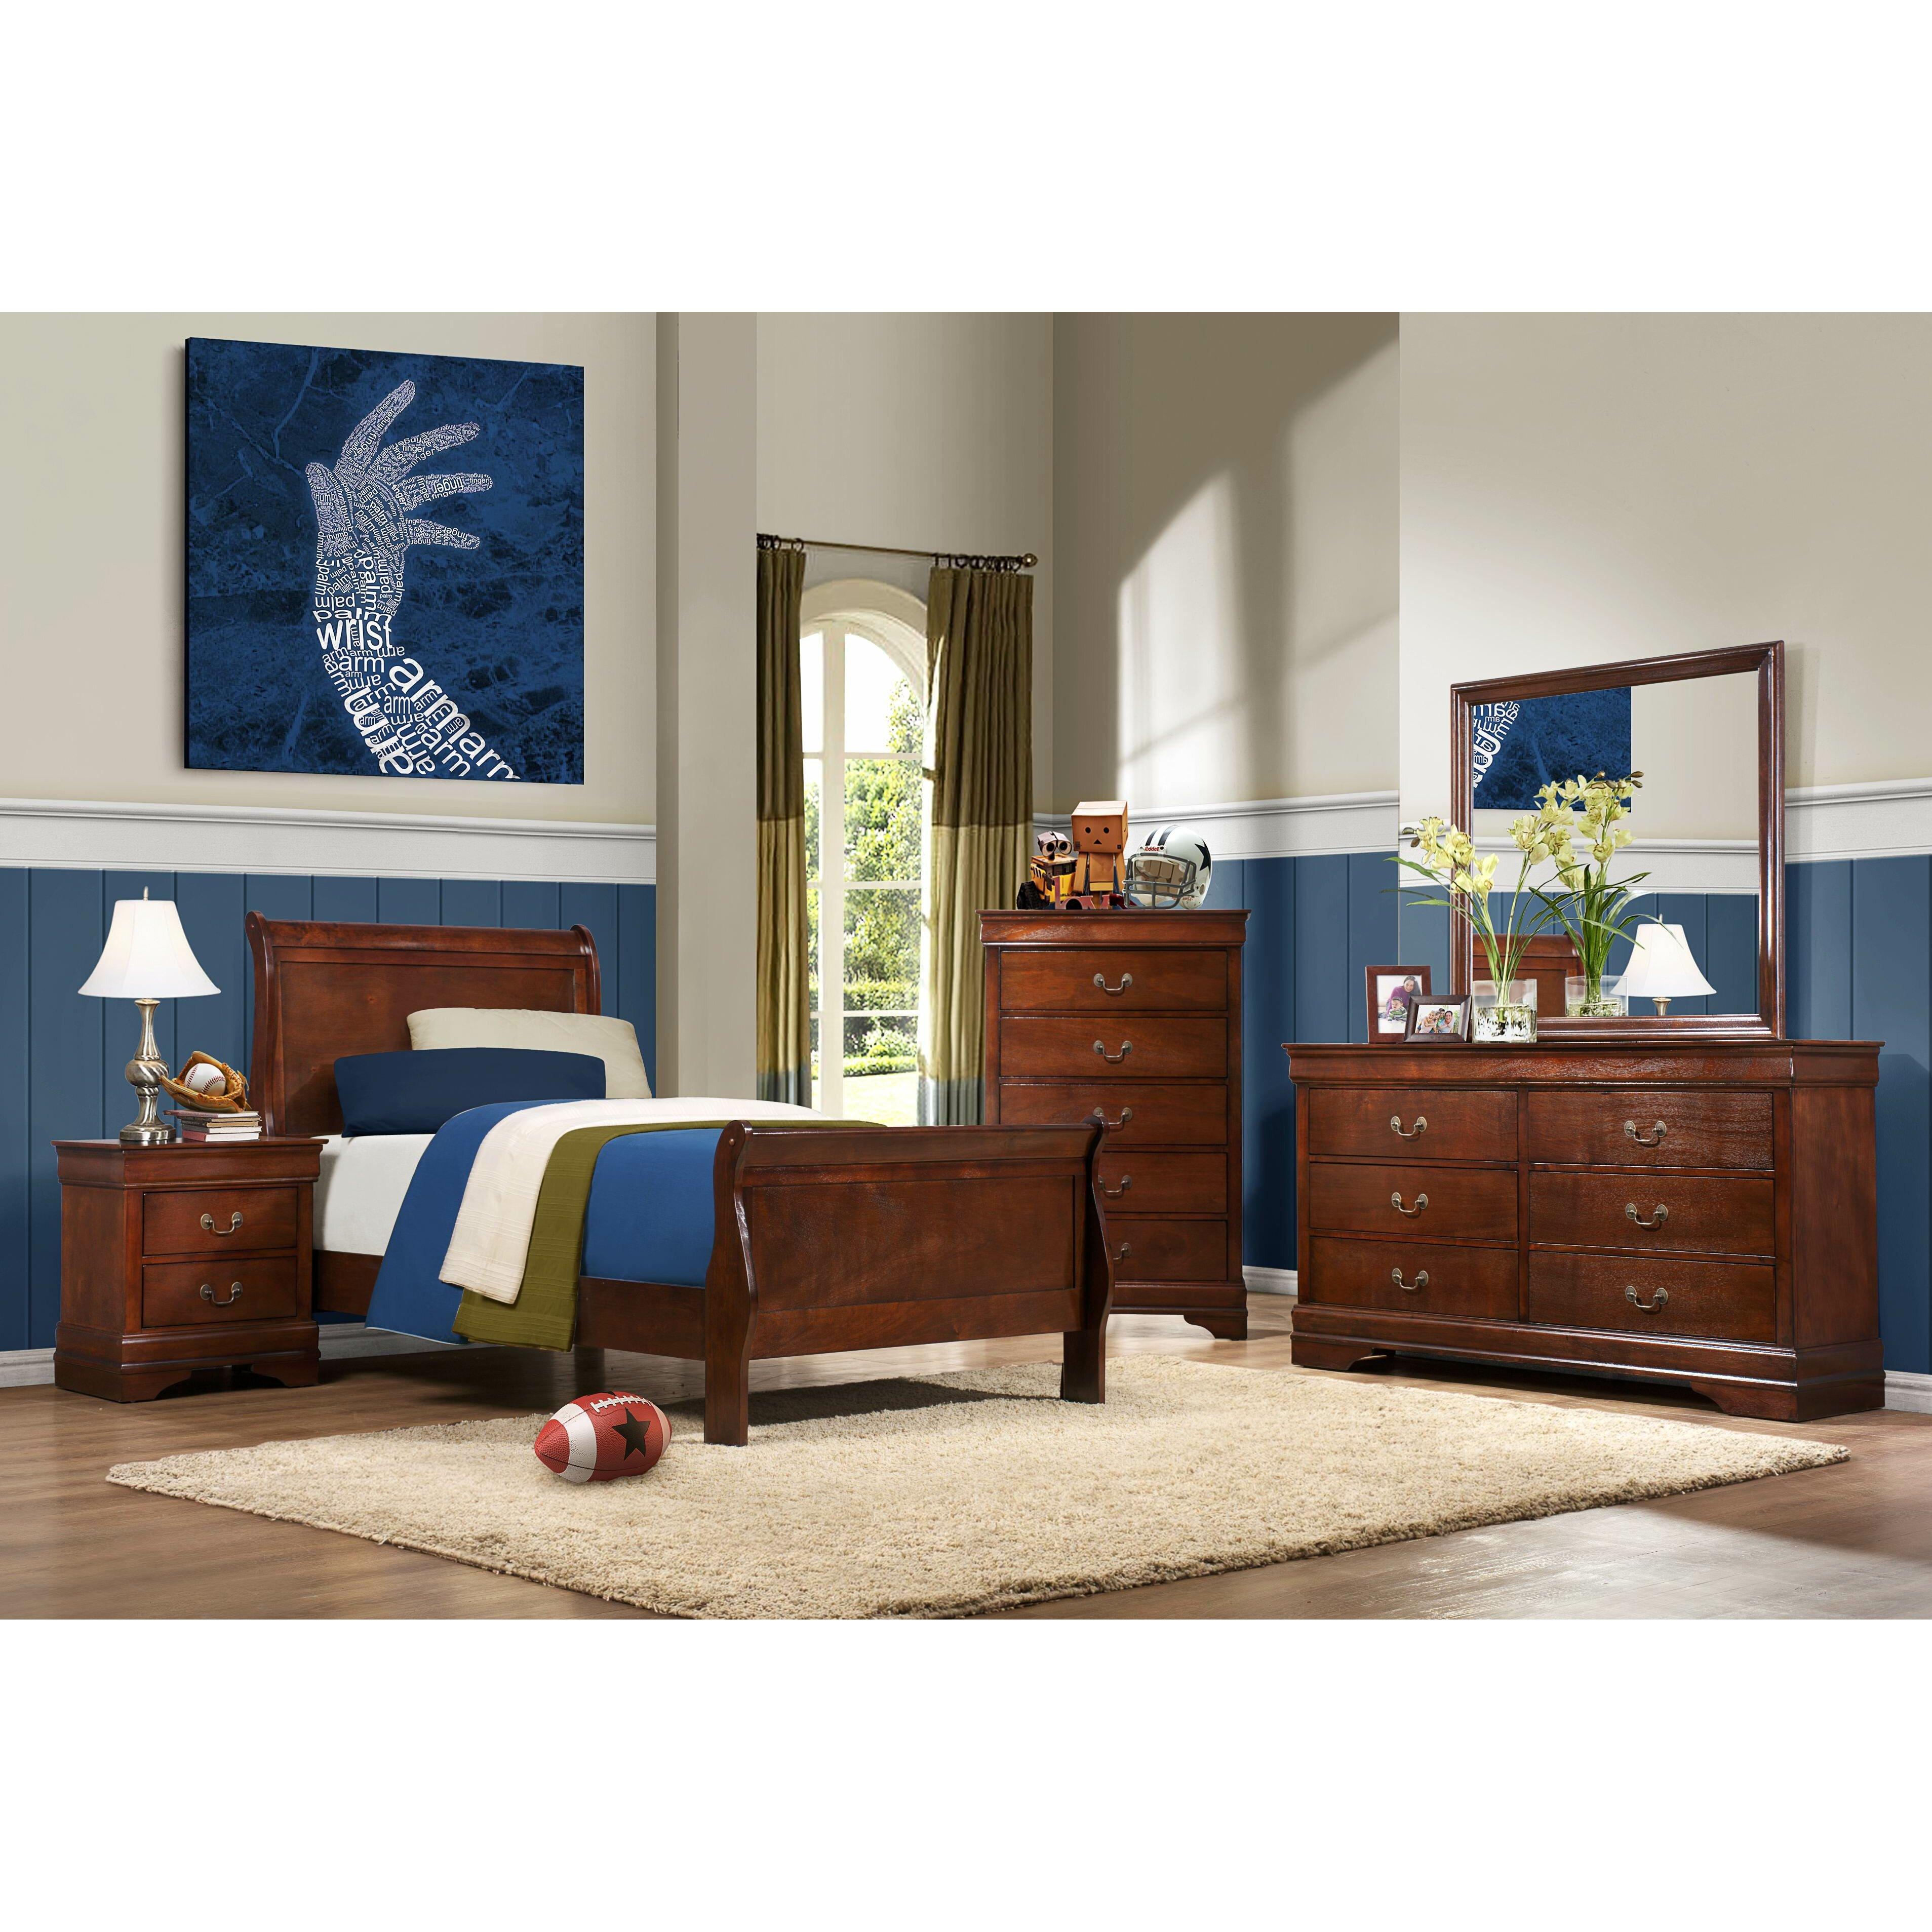 Metal Bedroom Furniture Sets Bedroom Furniture Sets Wayfair Lc Kids Charlotte Panel Bedroom